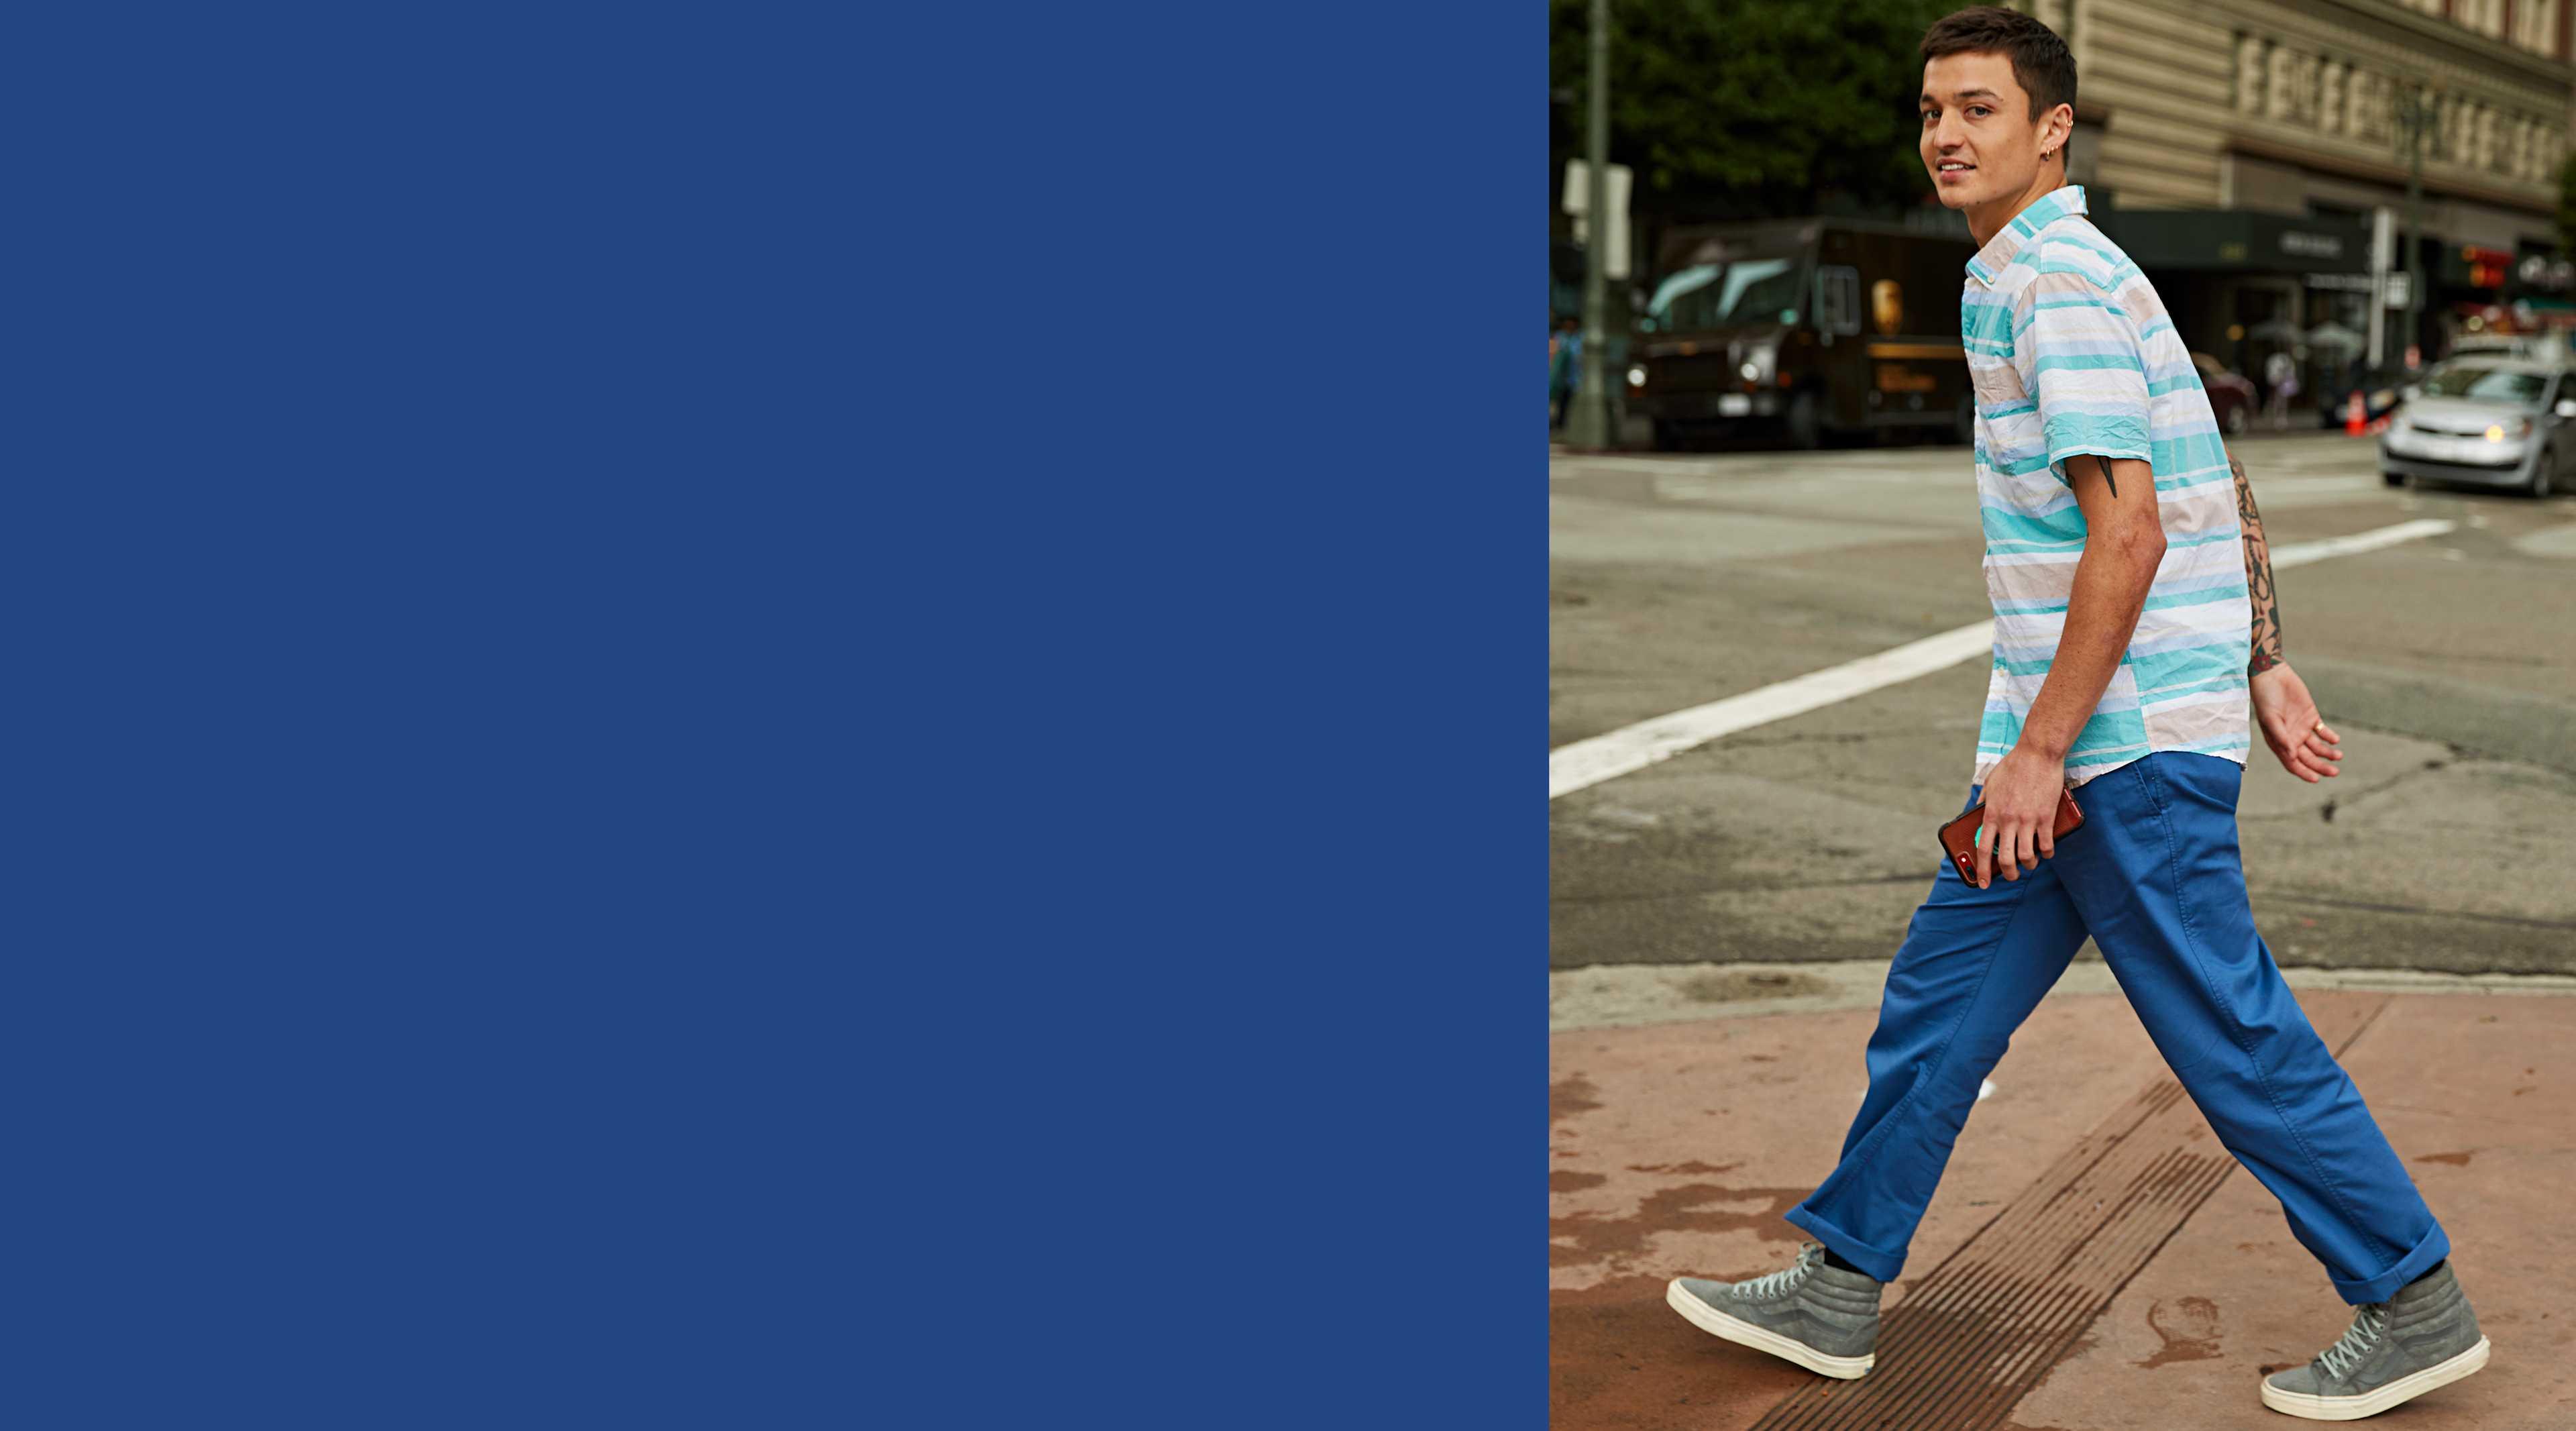 d13e8e26b89b26 Khakis, Men's Clothing, Shoes & Accessories | Dockers®